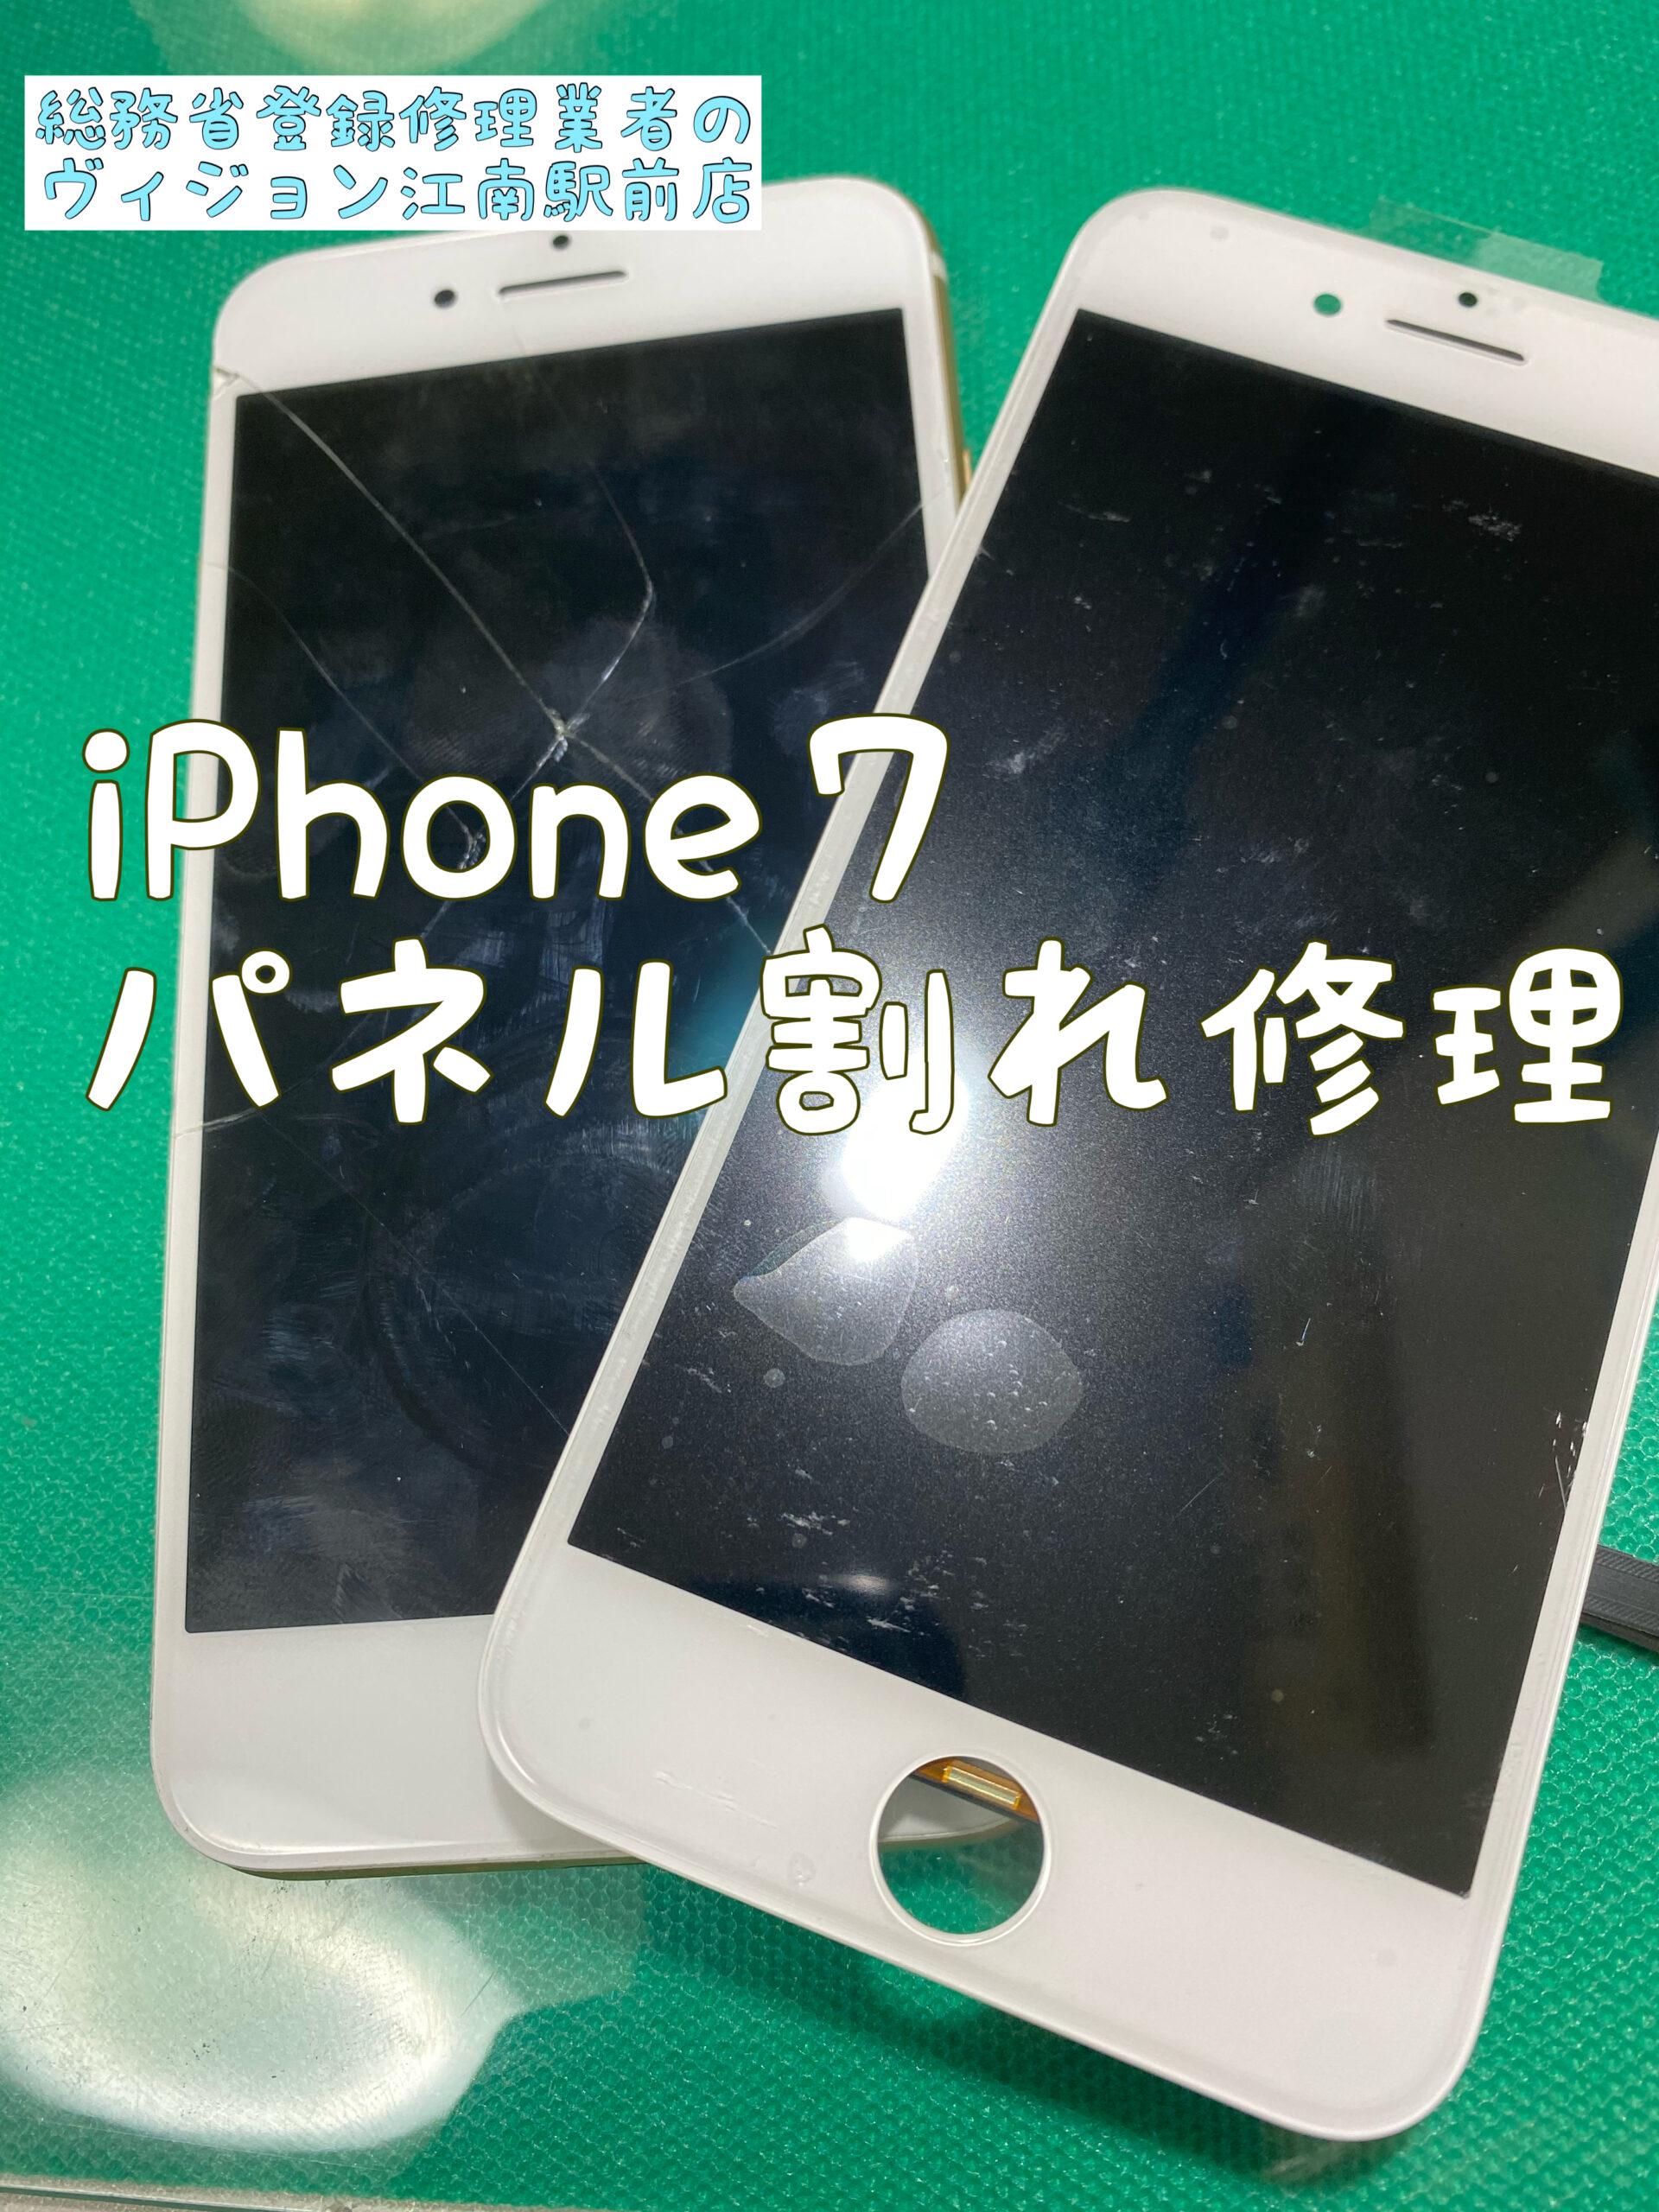 iPhone7 パネル割れ 画面割れ 液晶パネル交換 iPhone修理 スマホ修理 アイフォン修理 江南市 犬山市 扶桑町 大口町